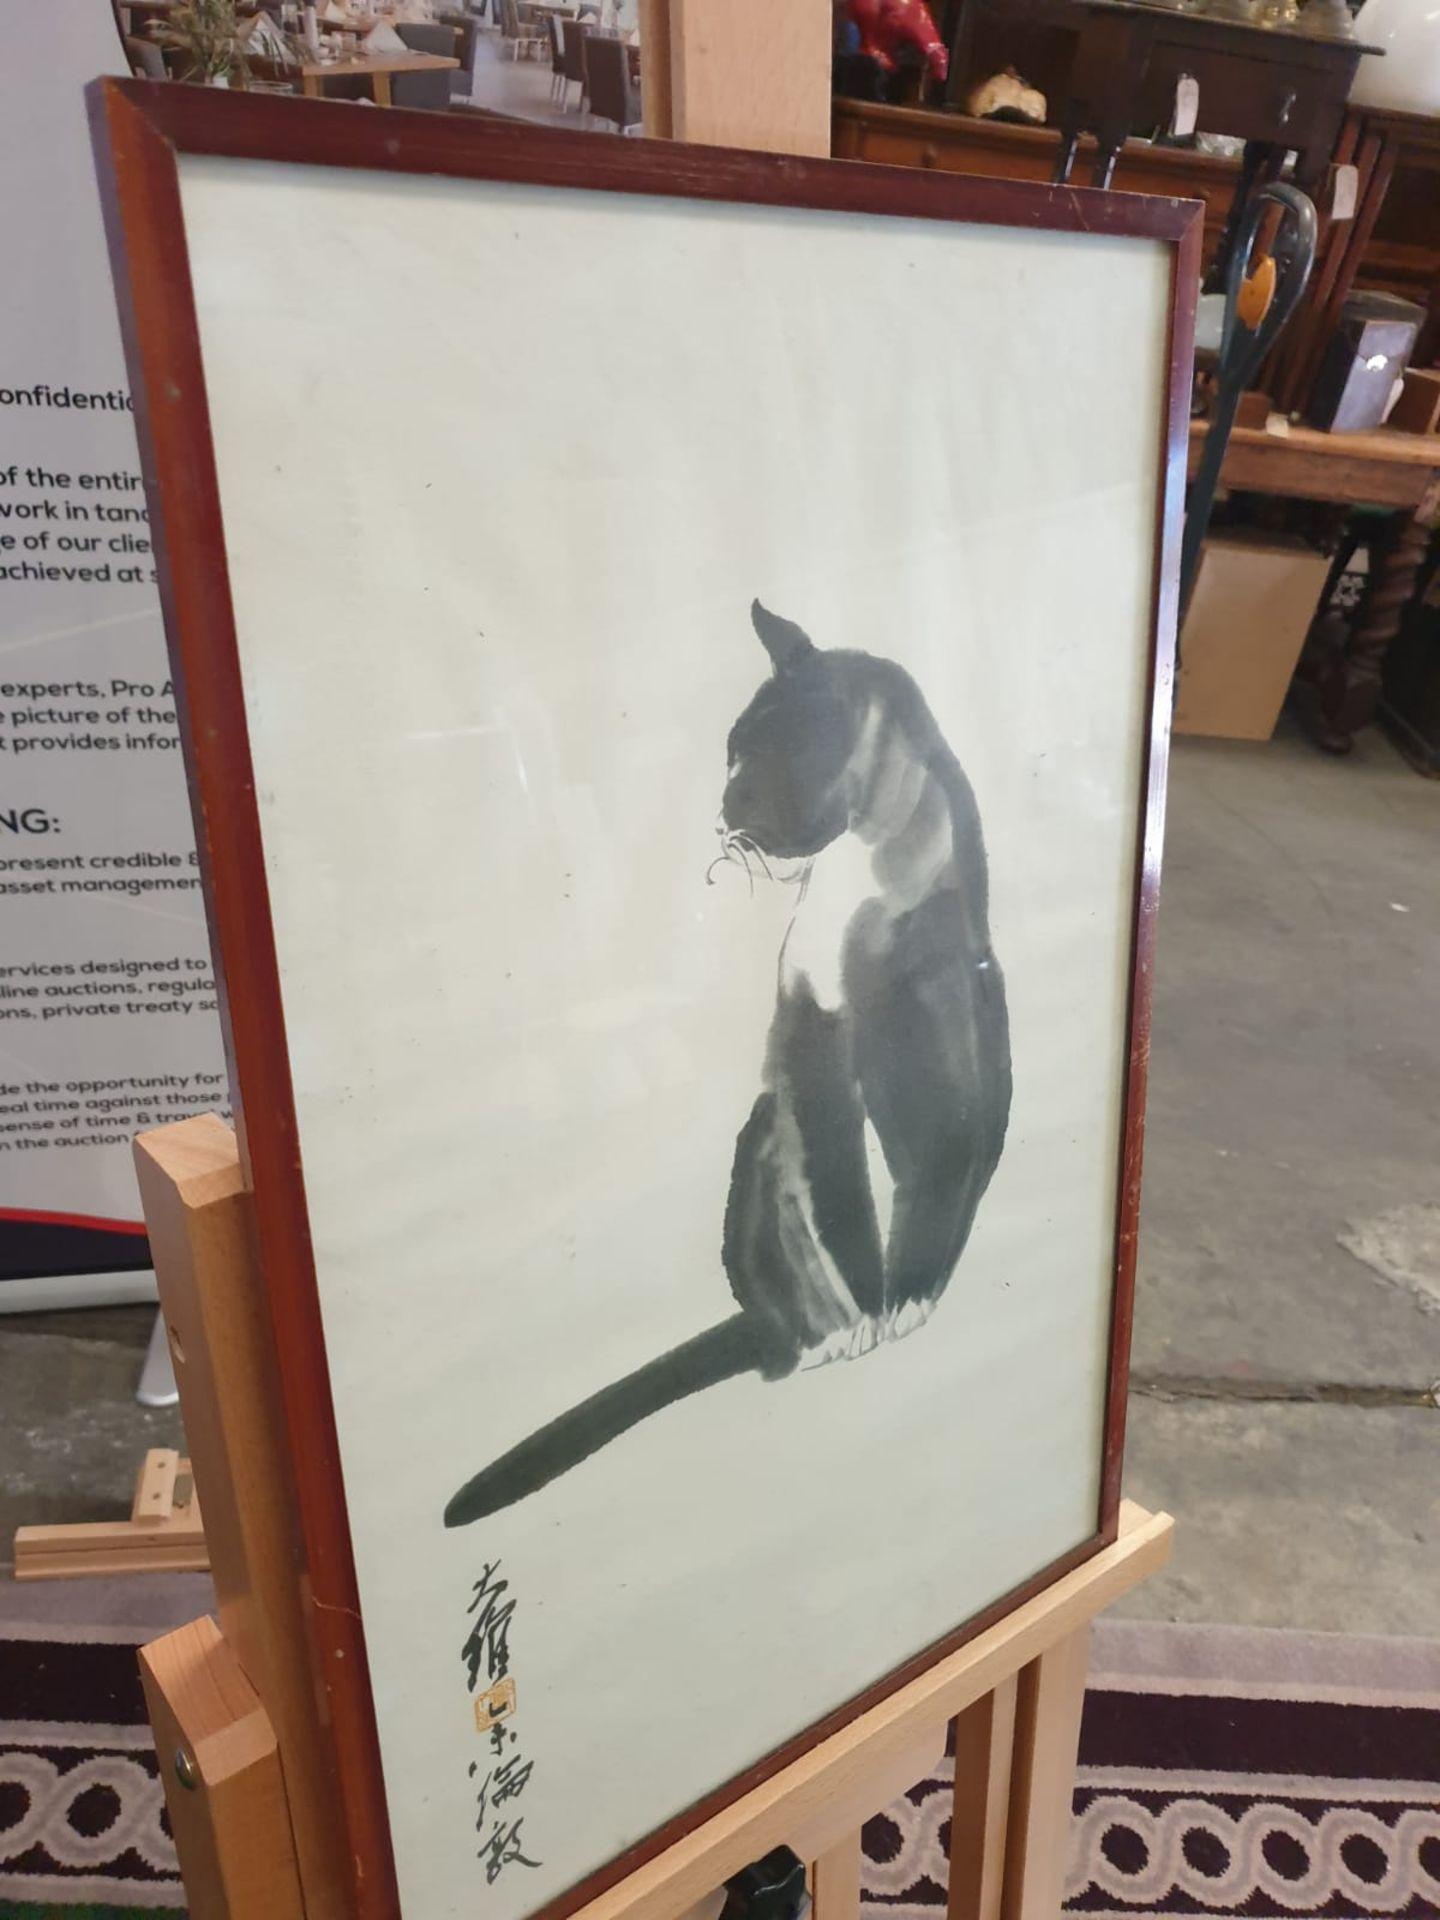 David Kwo Da-Wei (1919-2003) Chinese Lithographic Print Black Cat - Kim Da Wei Kwo, David Kwo 1919- - Image 2 of 4